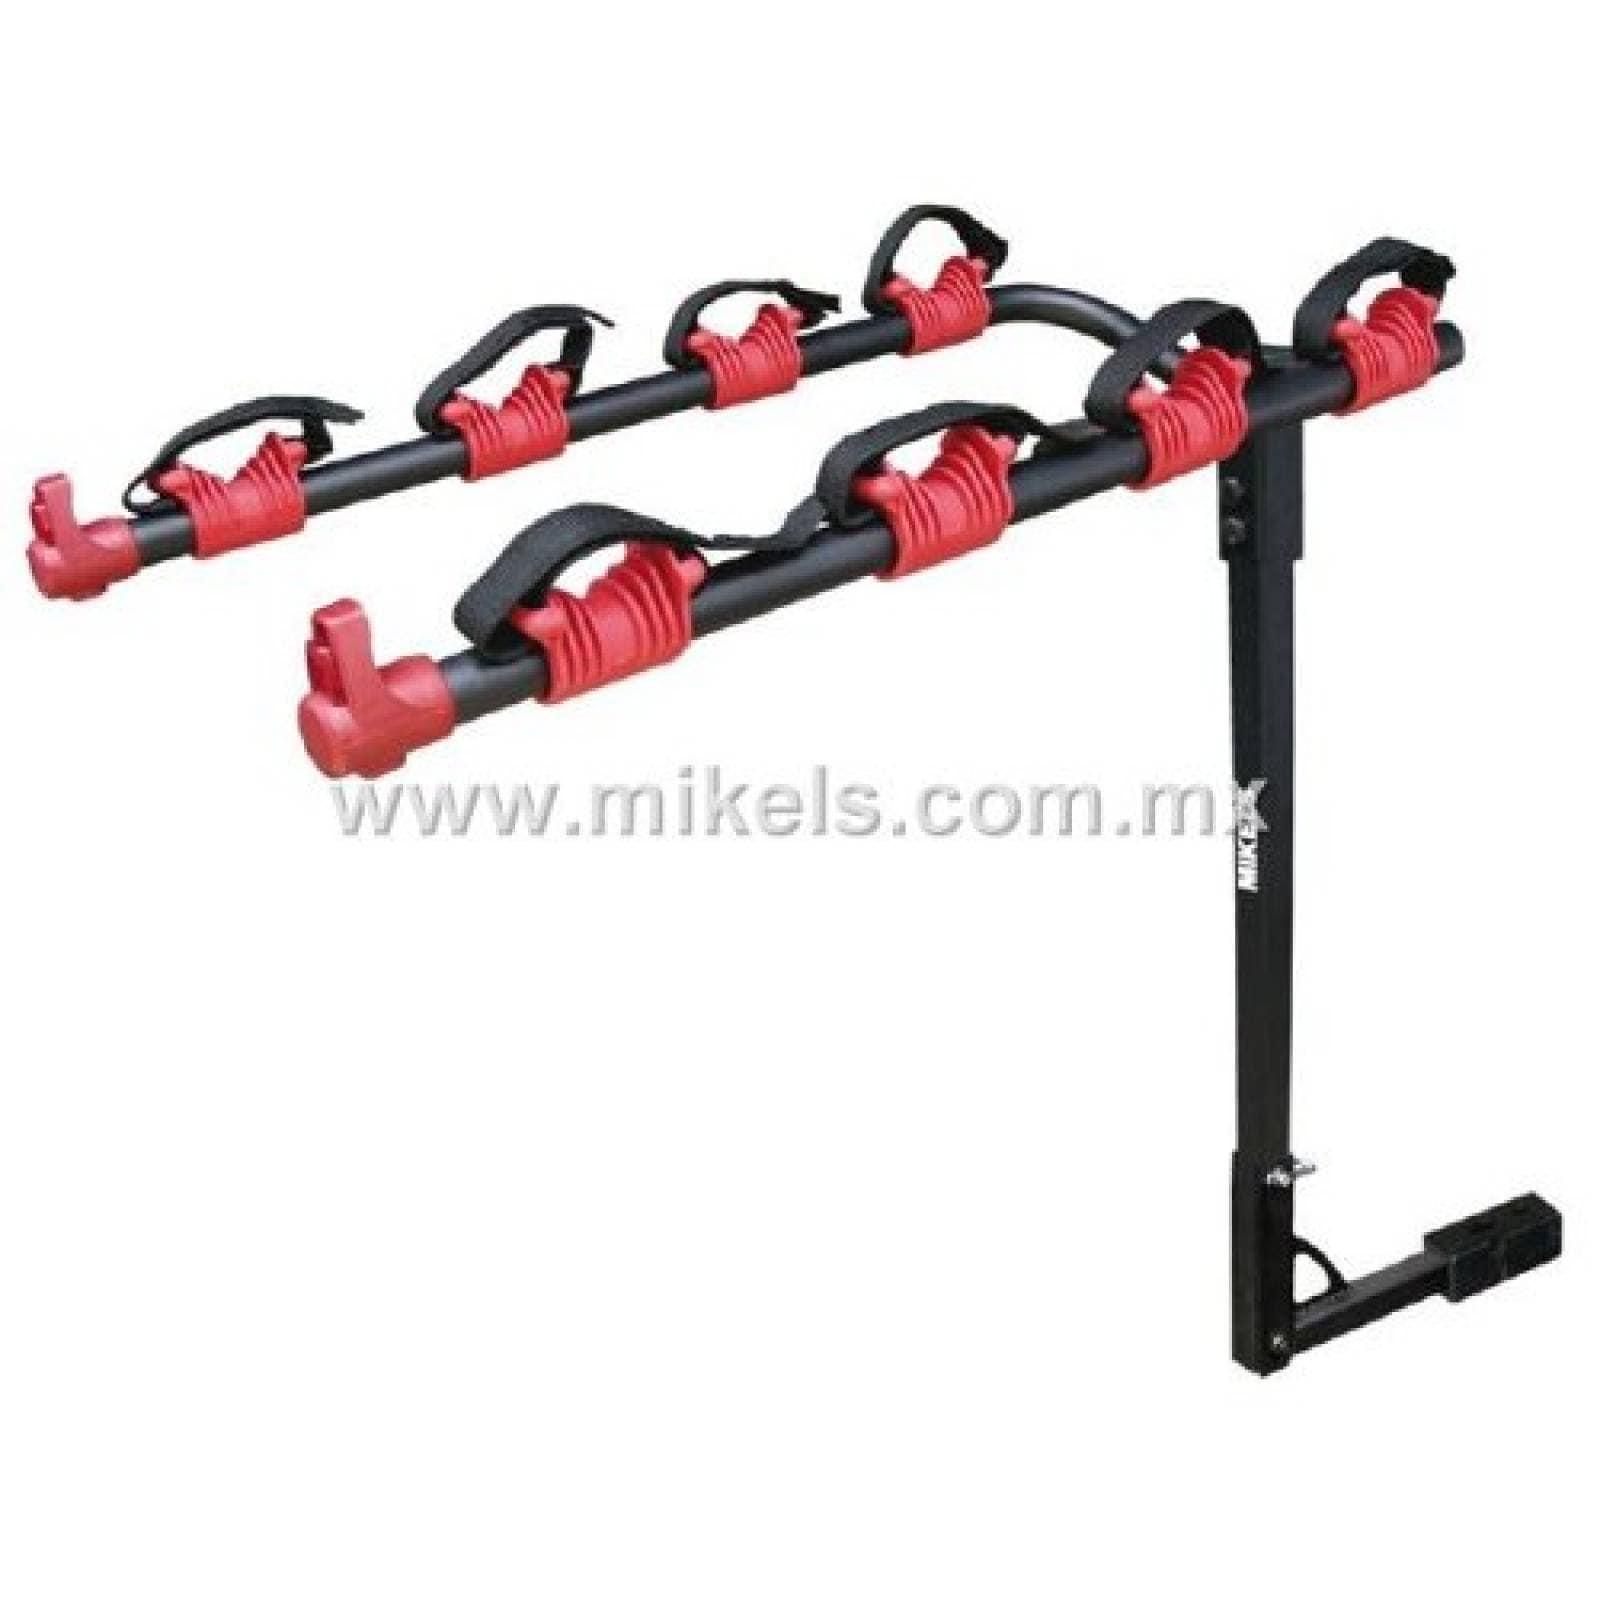 Rack Para Bicicleta Montaje En Tiron 4 Bicicletas